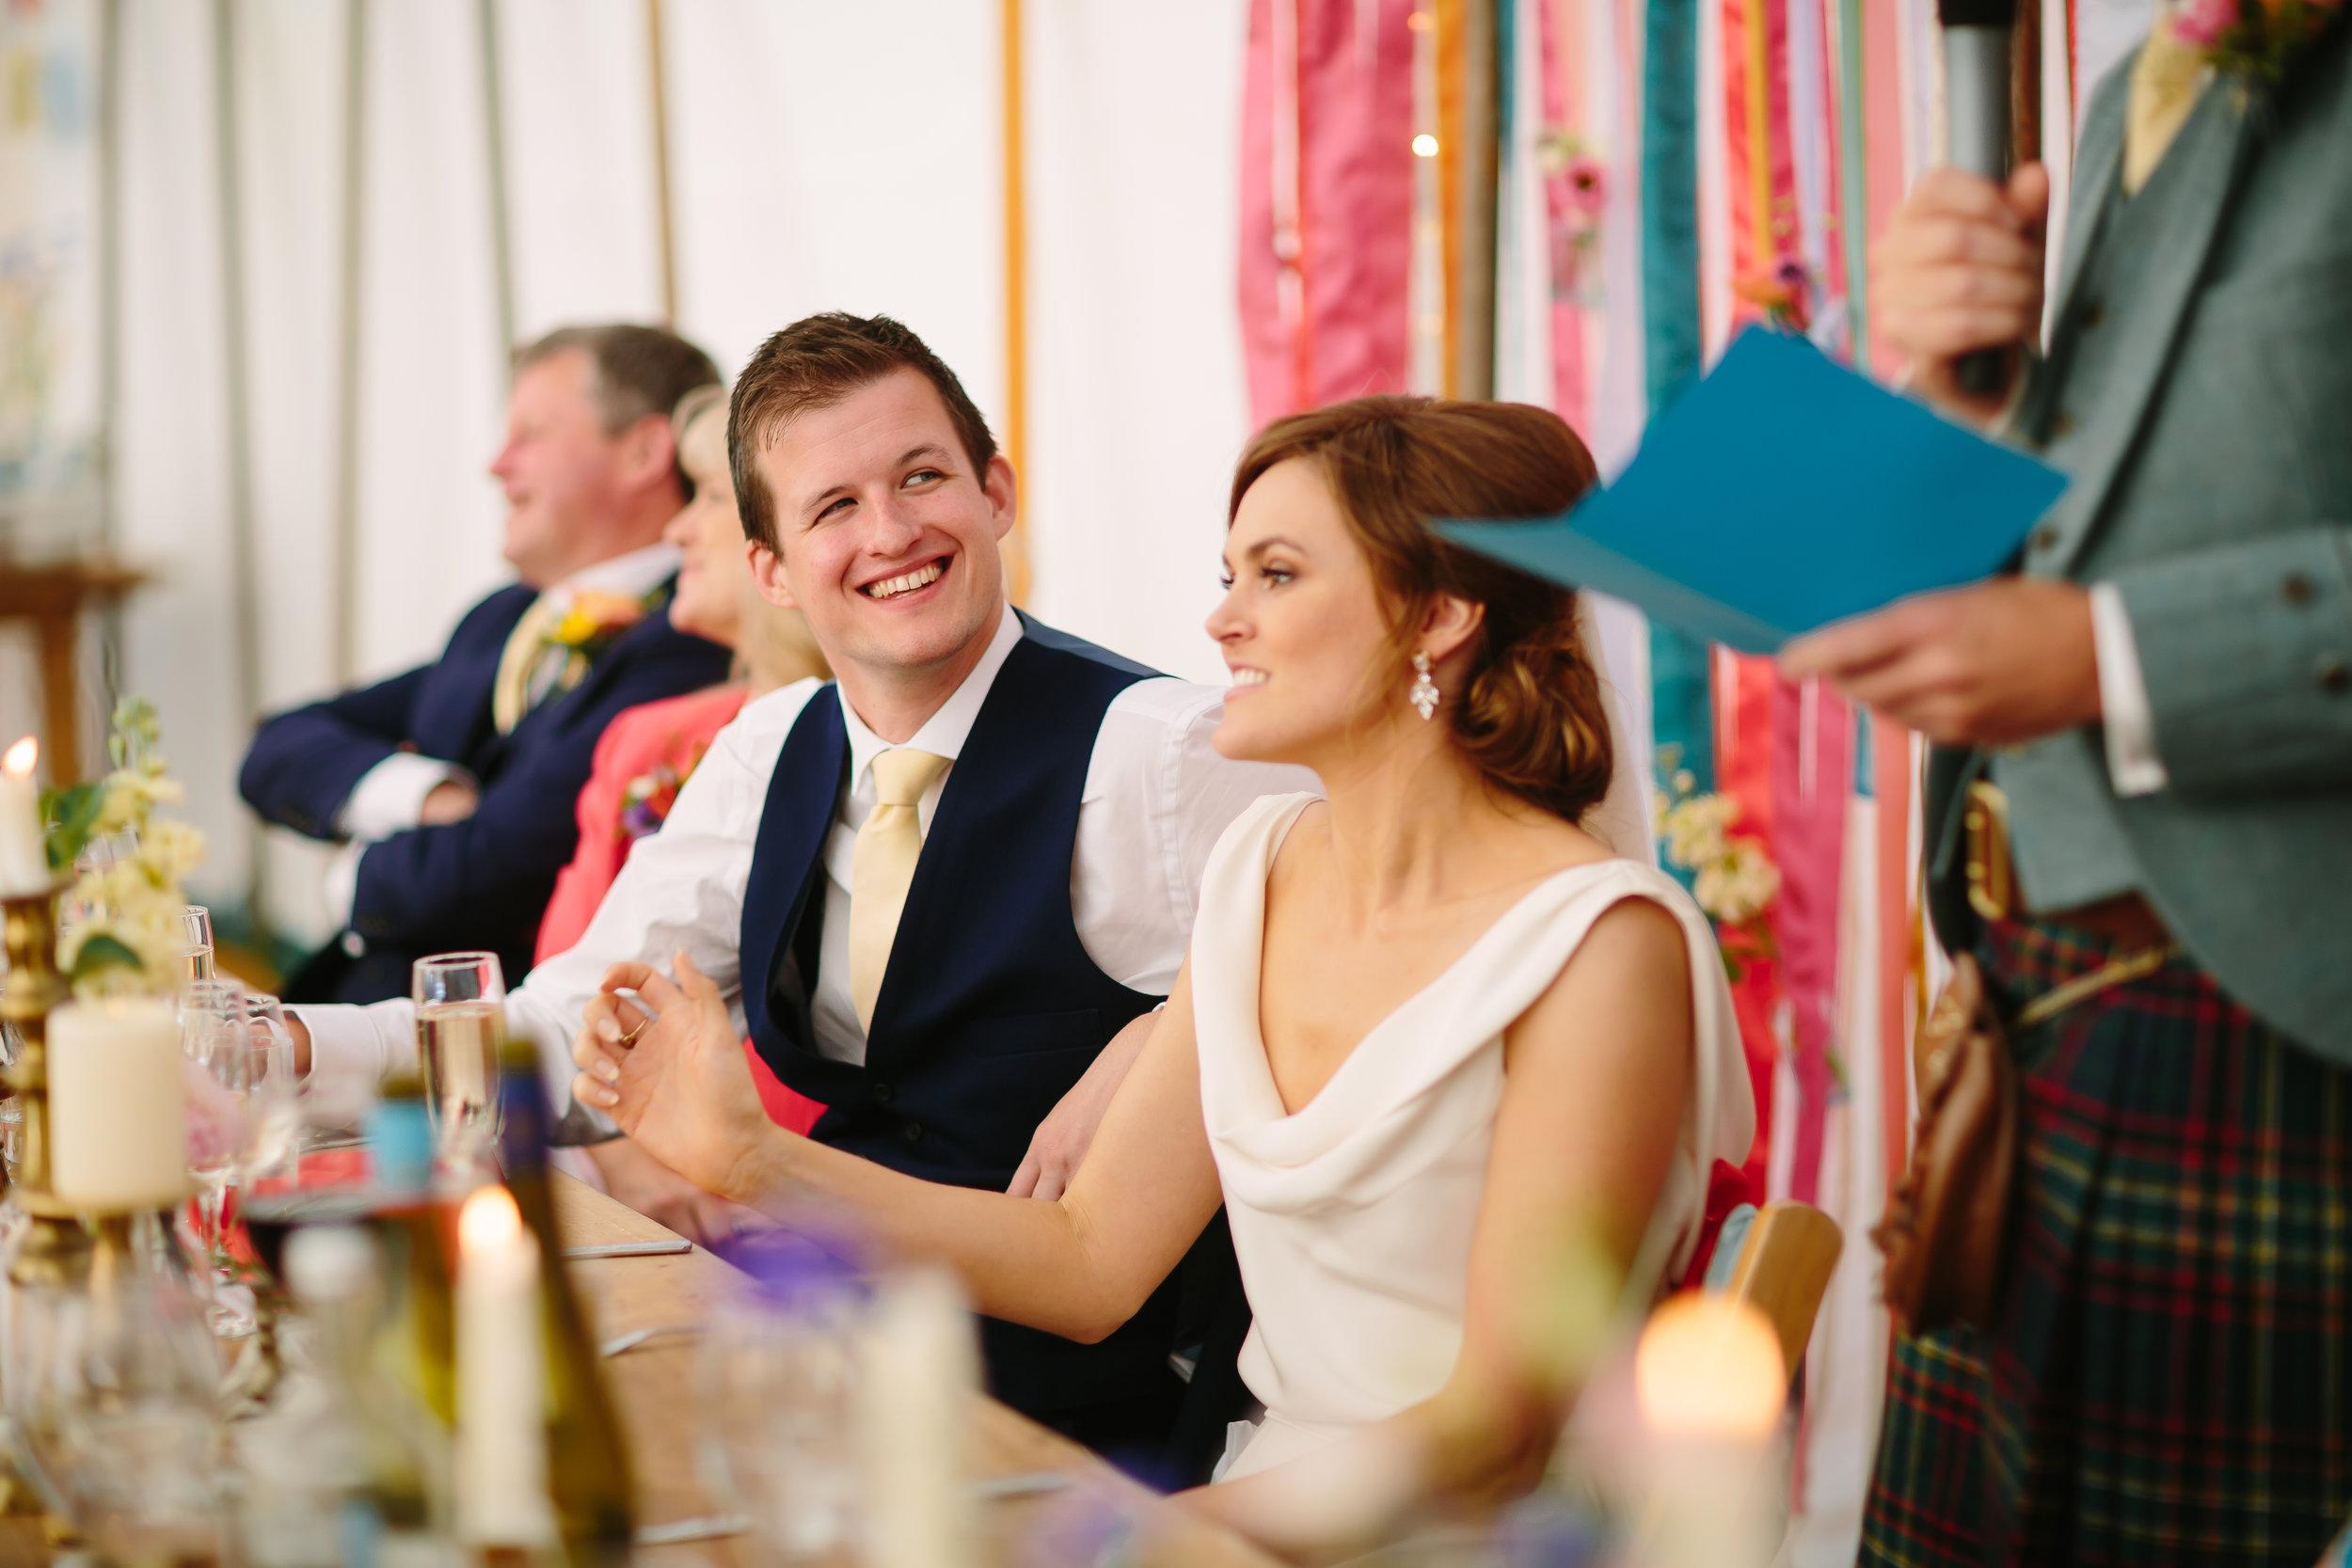 Wedding-Stockerston-Weddingphotographer-70.jpg